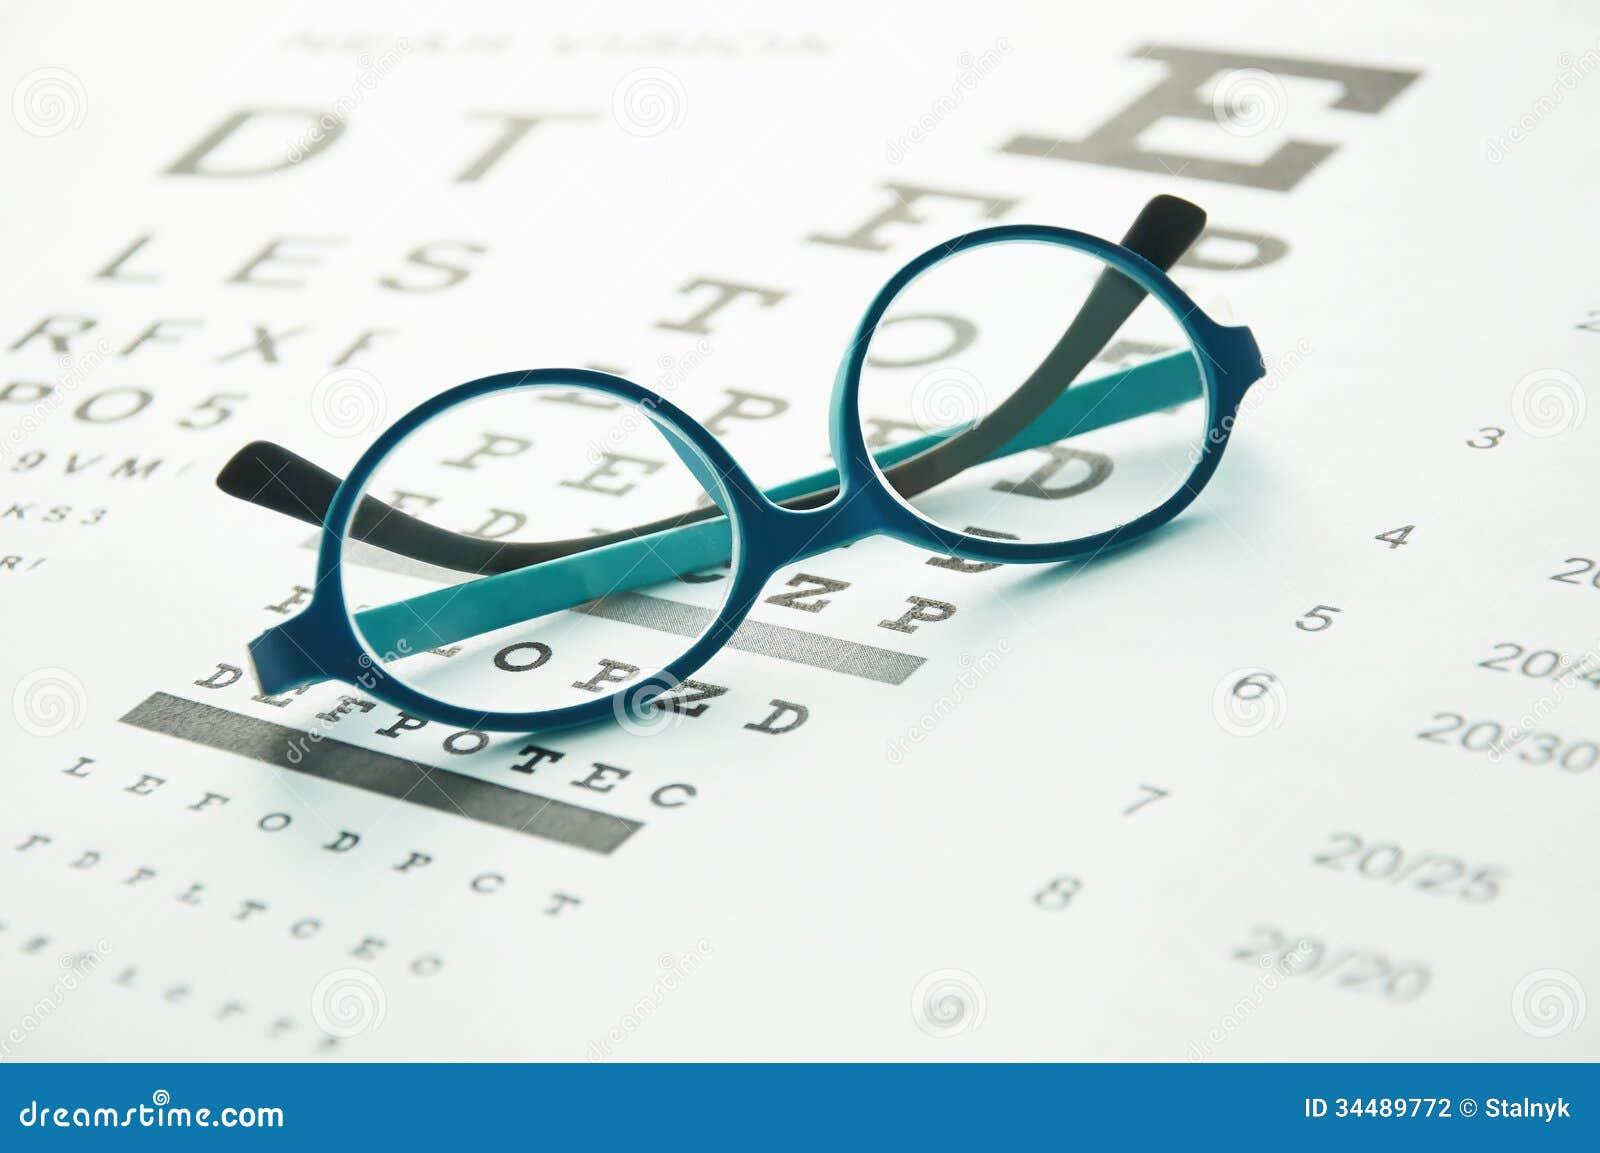 Glasses on eye chart stock image image of examination 23049047 glasses on eye chart stock photography geenschuldenfo Gallery